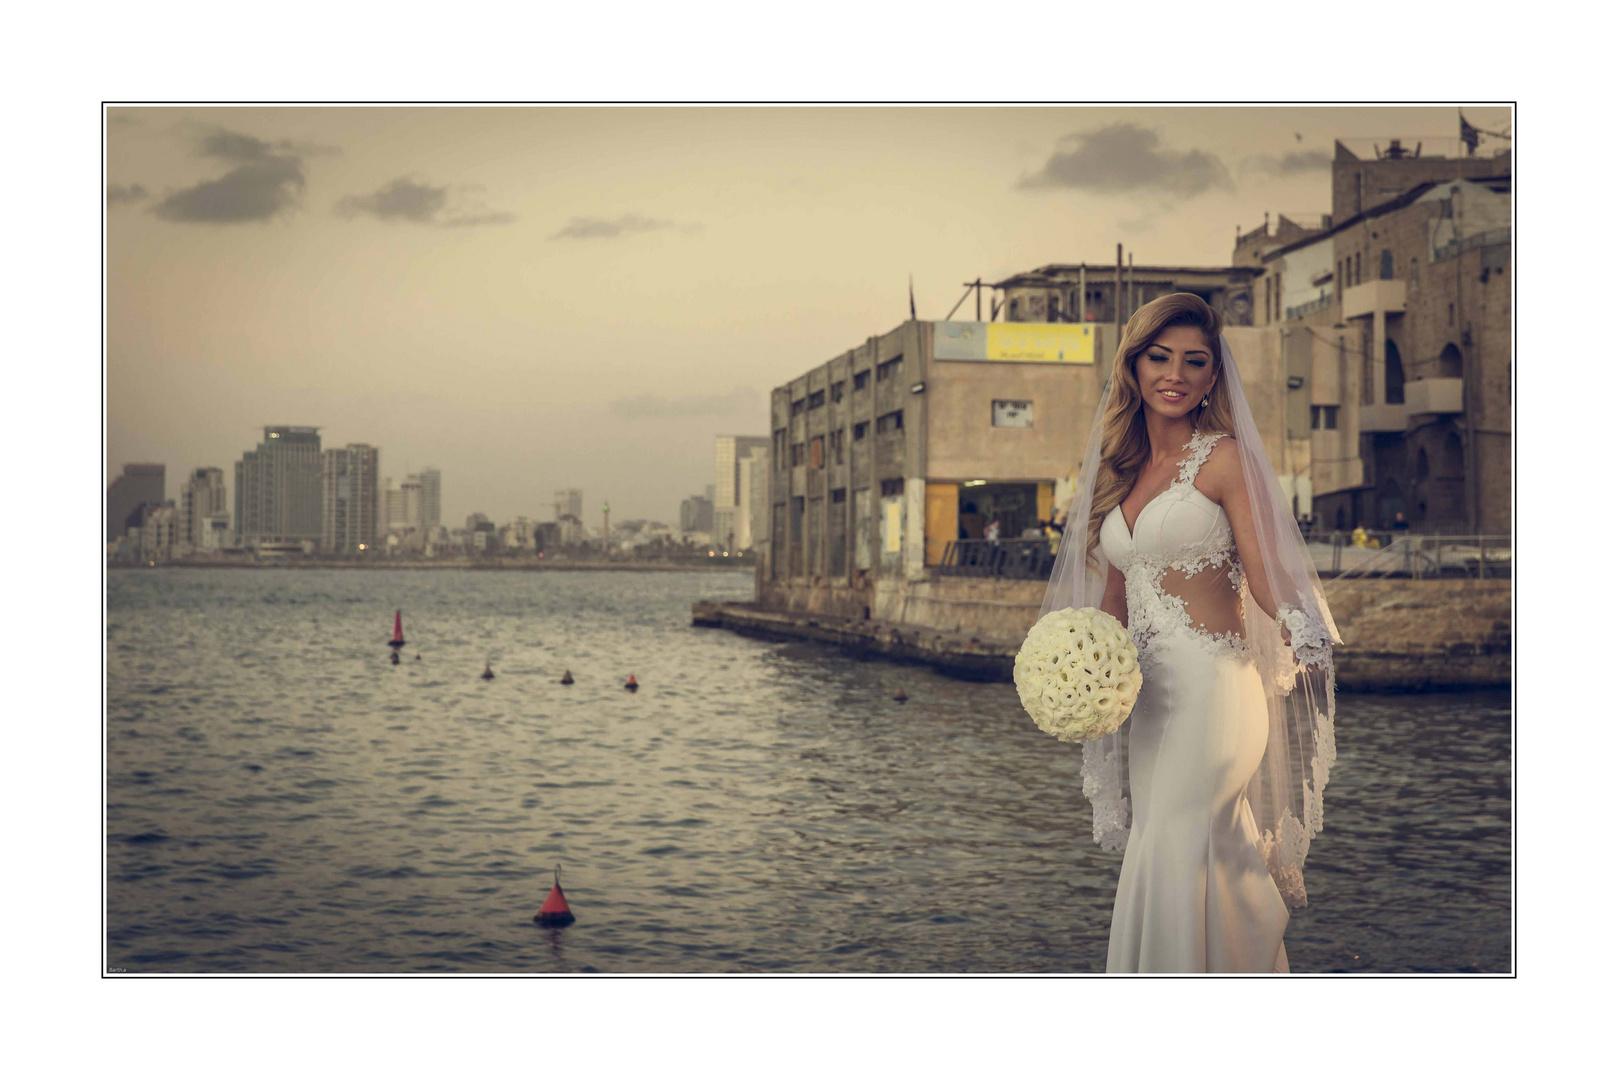 The Bride of Tel Aviv